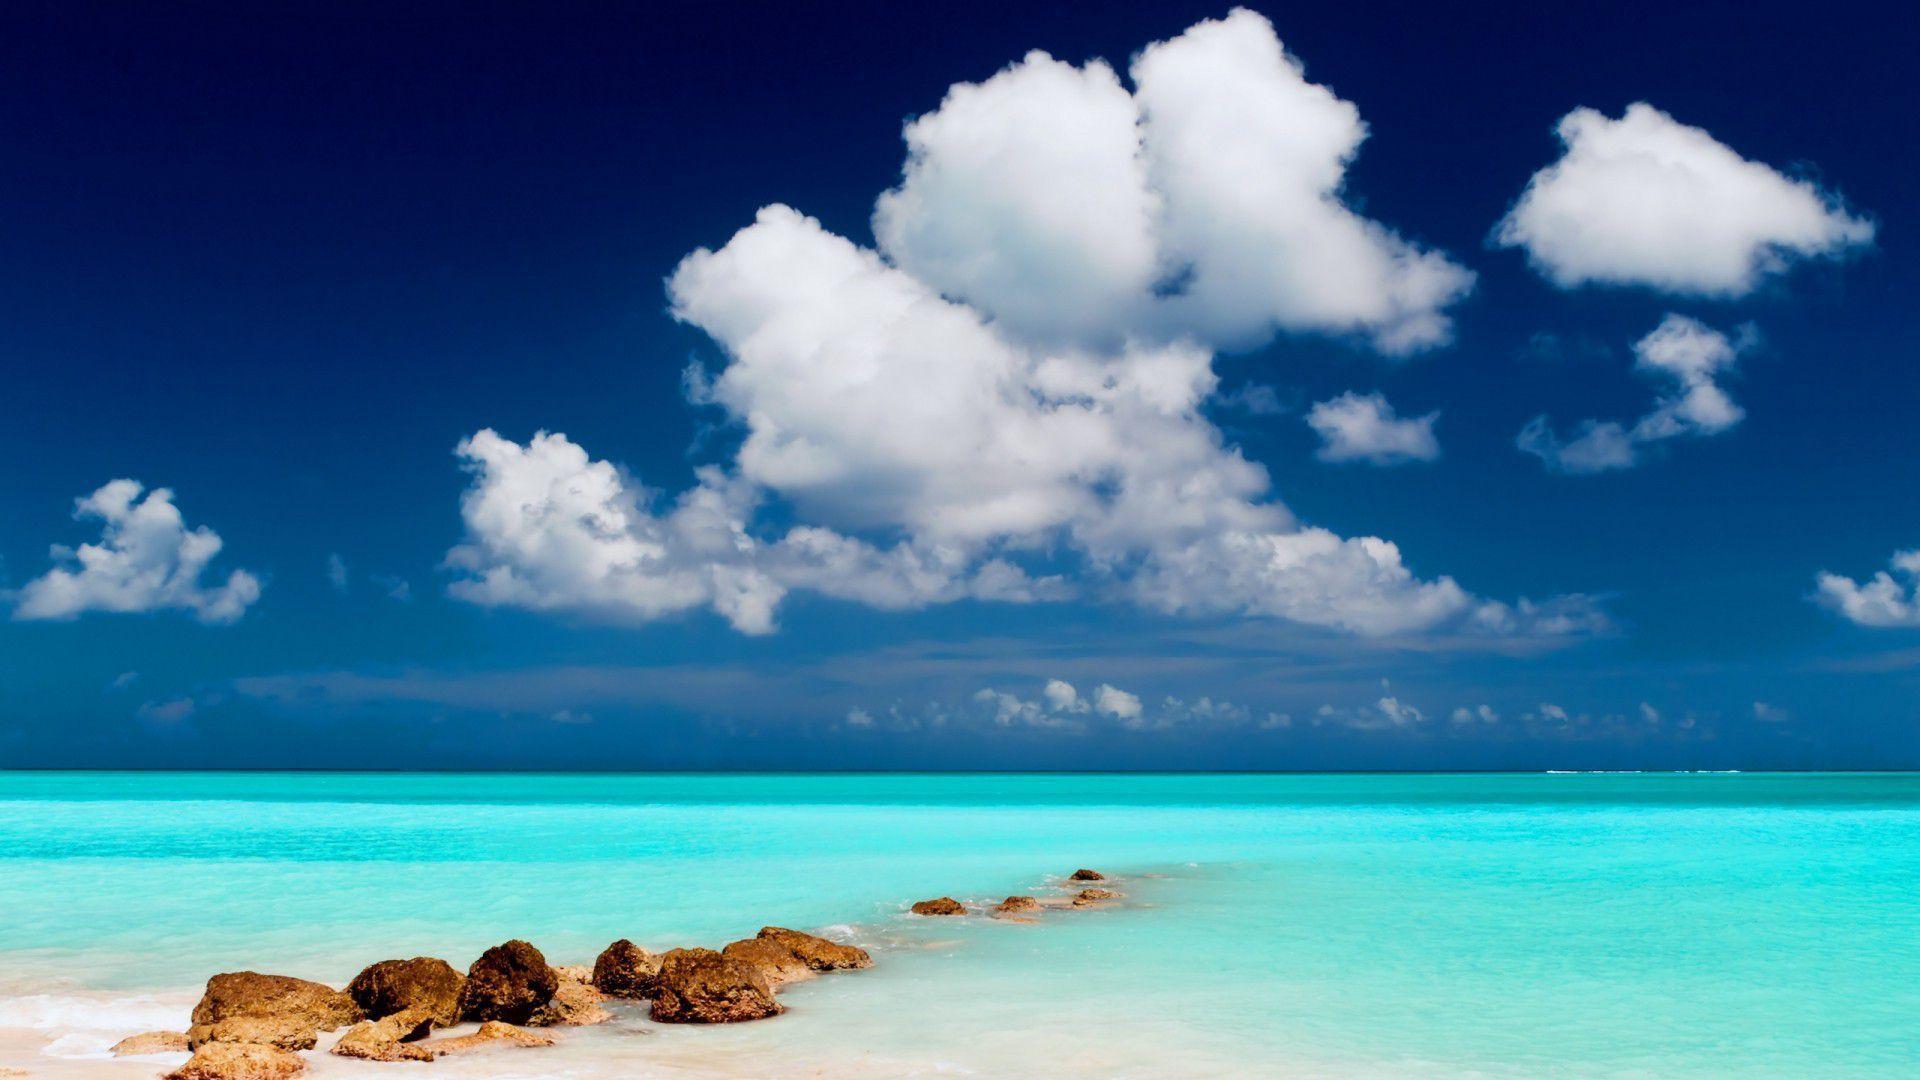 Turquoise Sea Hd Wallpaper